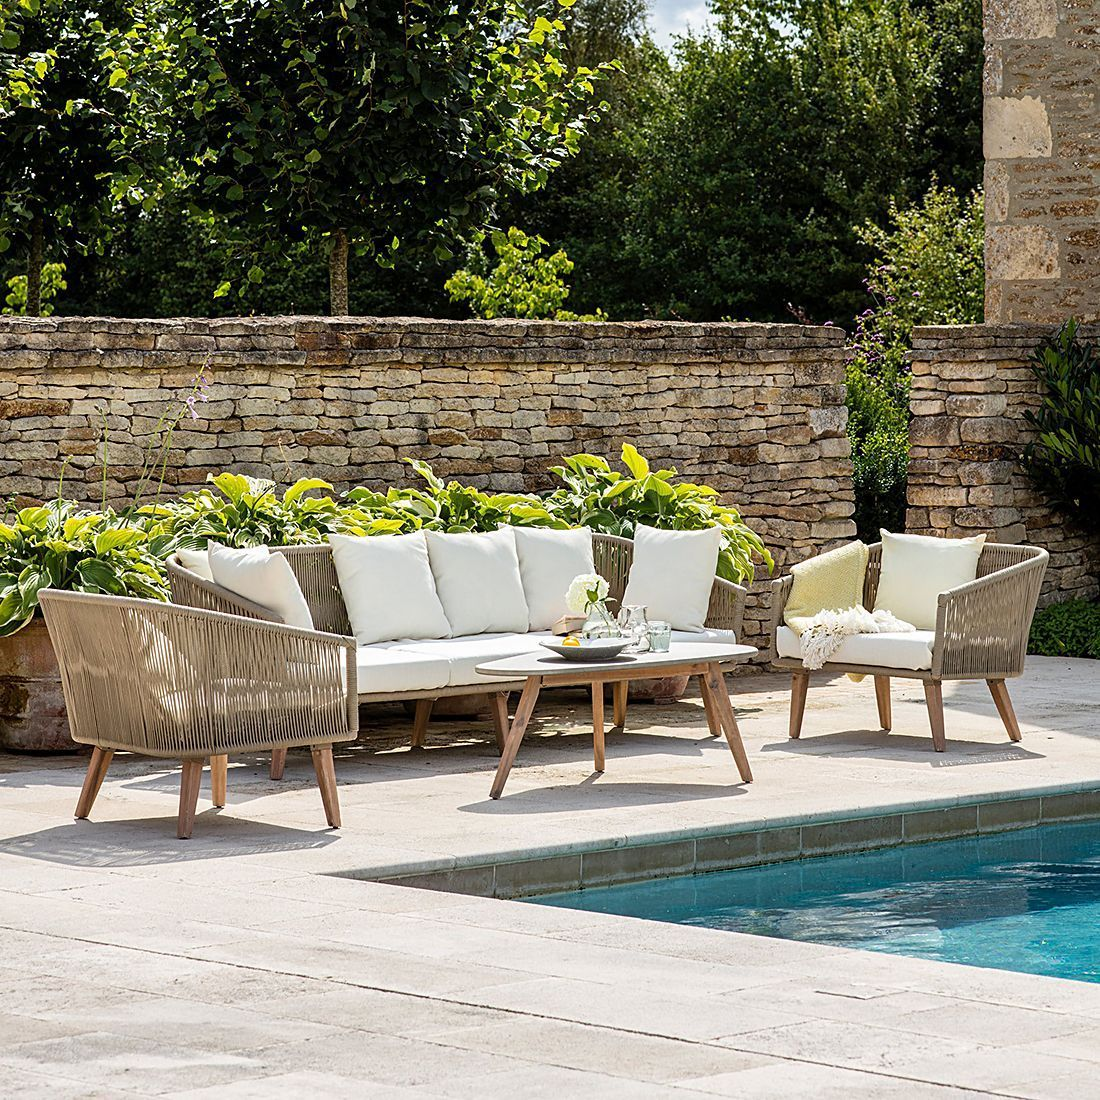 Garden Furniture Doesn